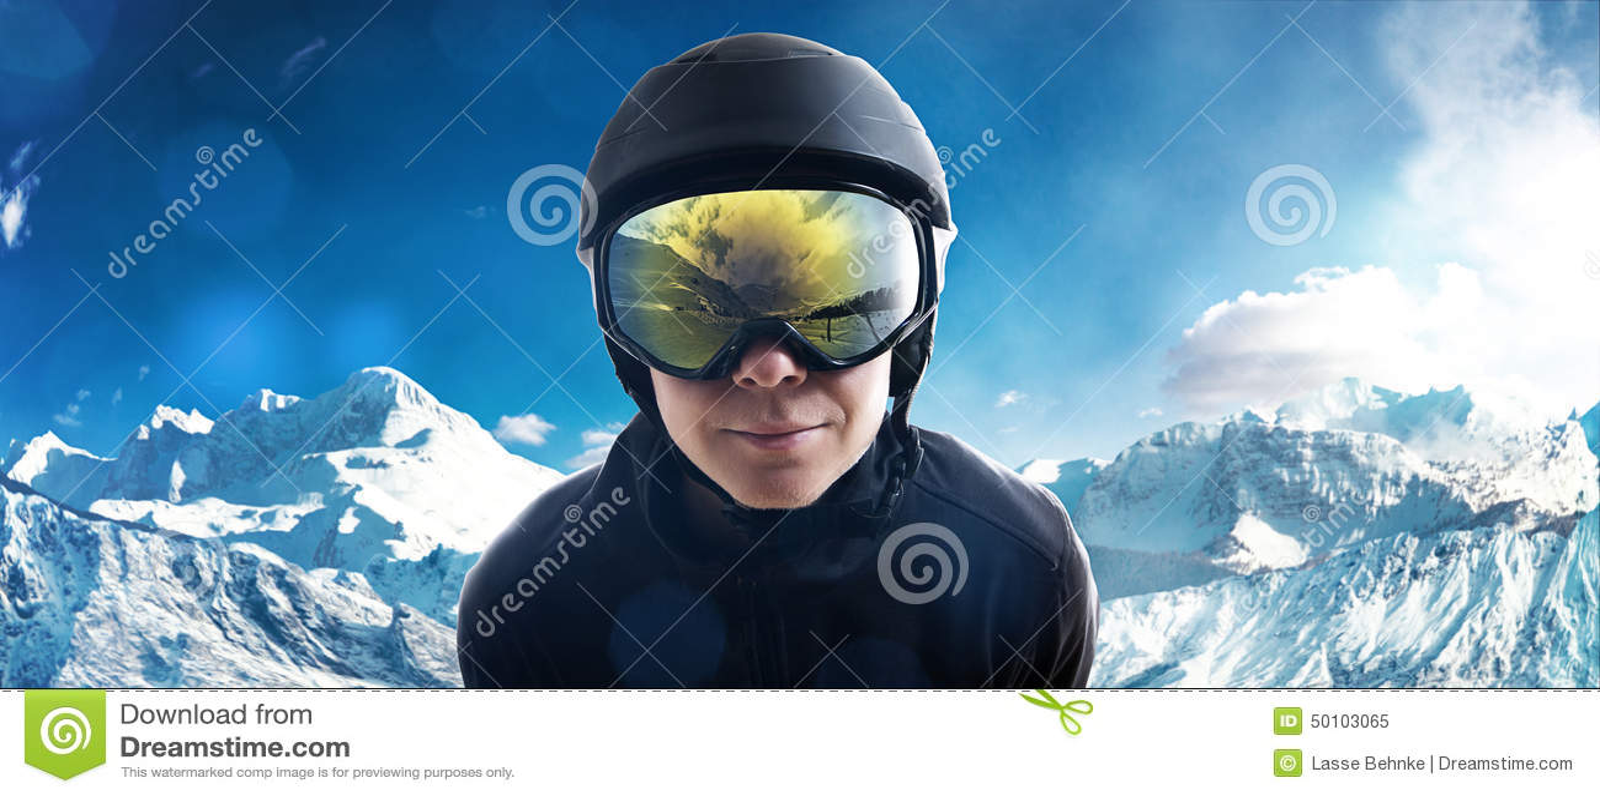 Azul, tarjeta, huésped, embarque, ejercicio, extremo, diversión, cometa, kiteboard, kiteboarding, kitesail, kitesurf, kiting, lag